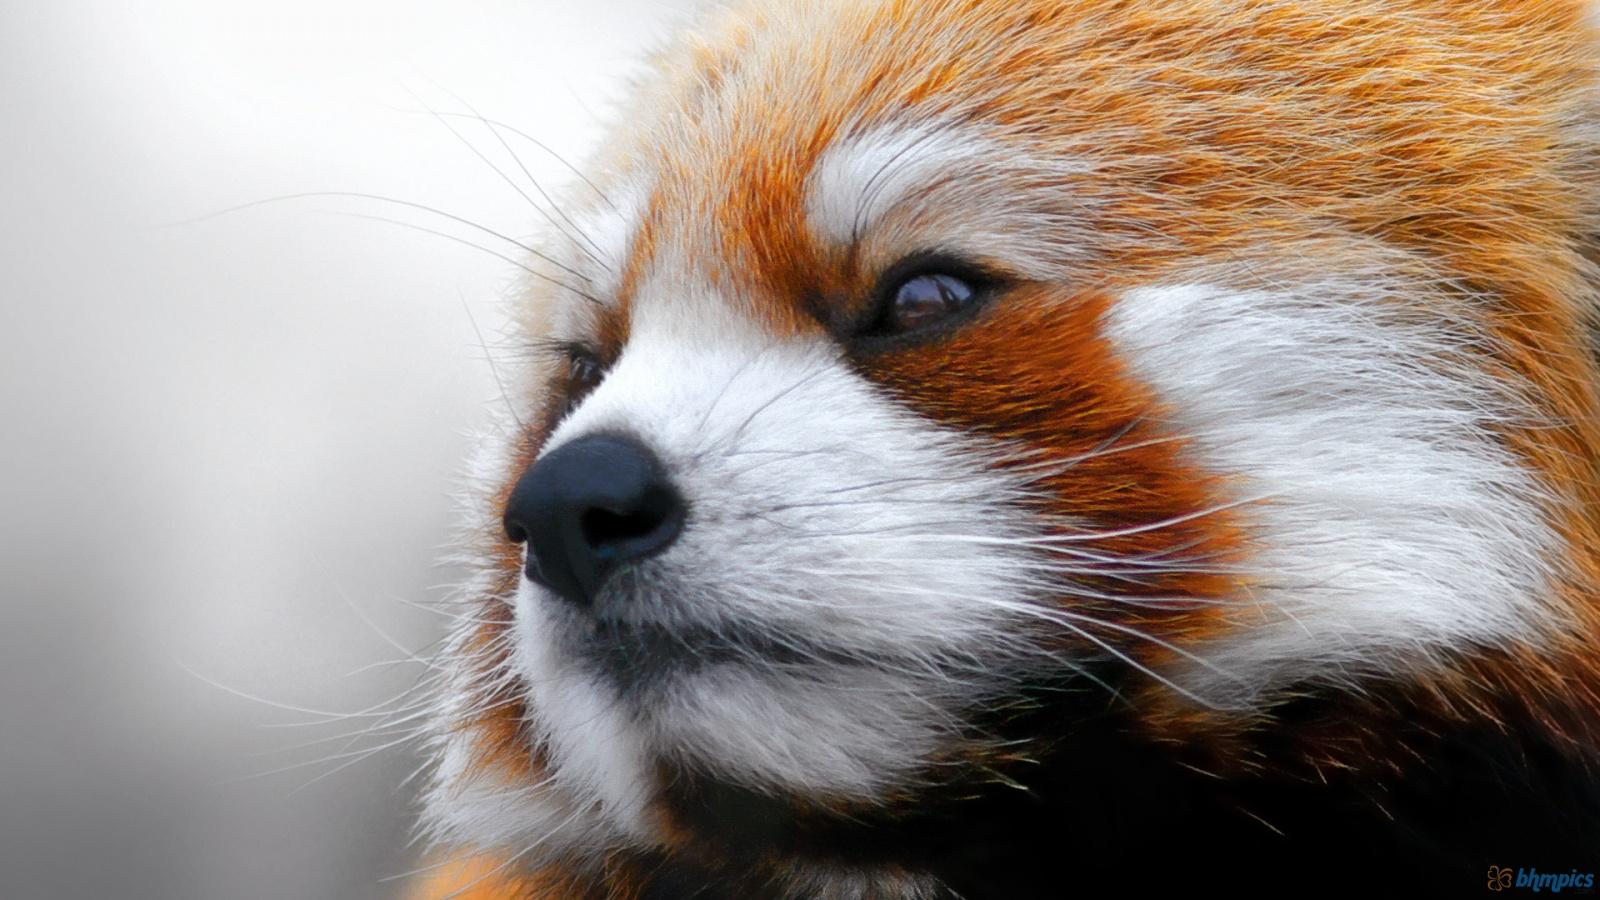 I'm not a red panda.